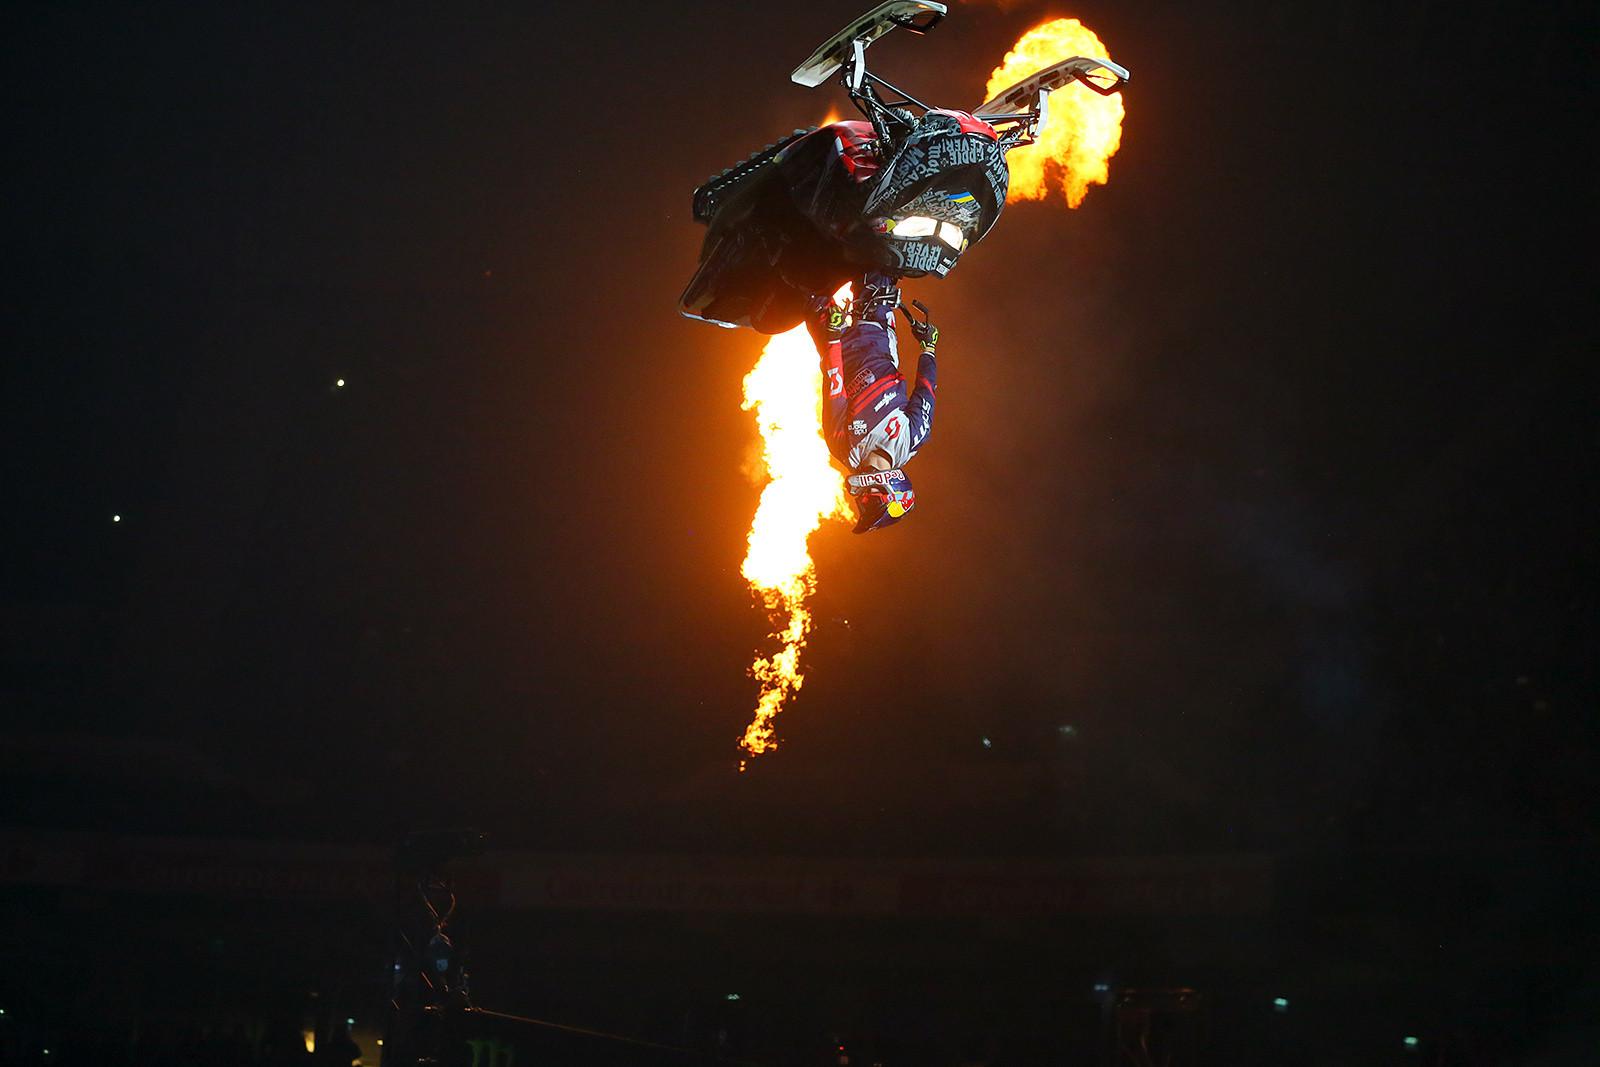 Daniel Bodin - Photo Gallery: Paris-Lille Supercross, Day 2 - Motocross Pictures - Vital MX